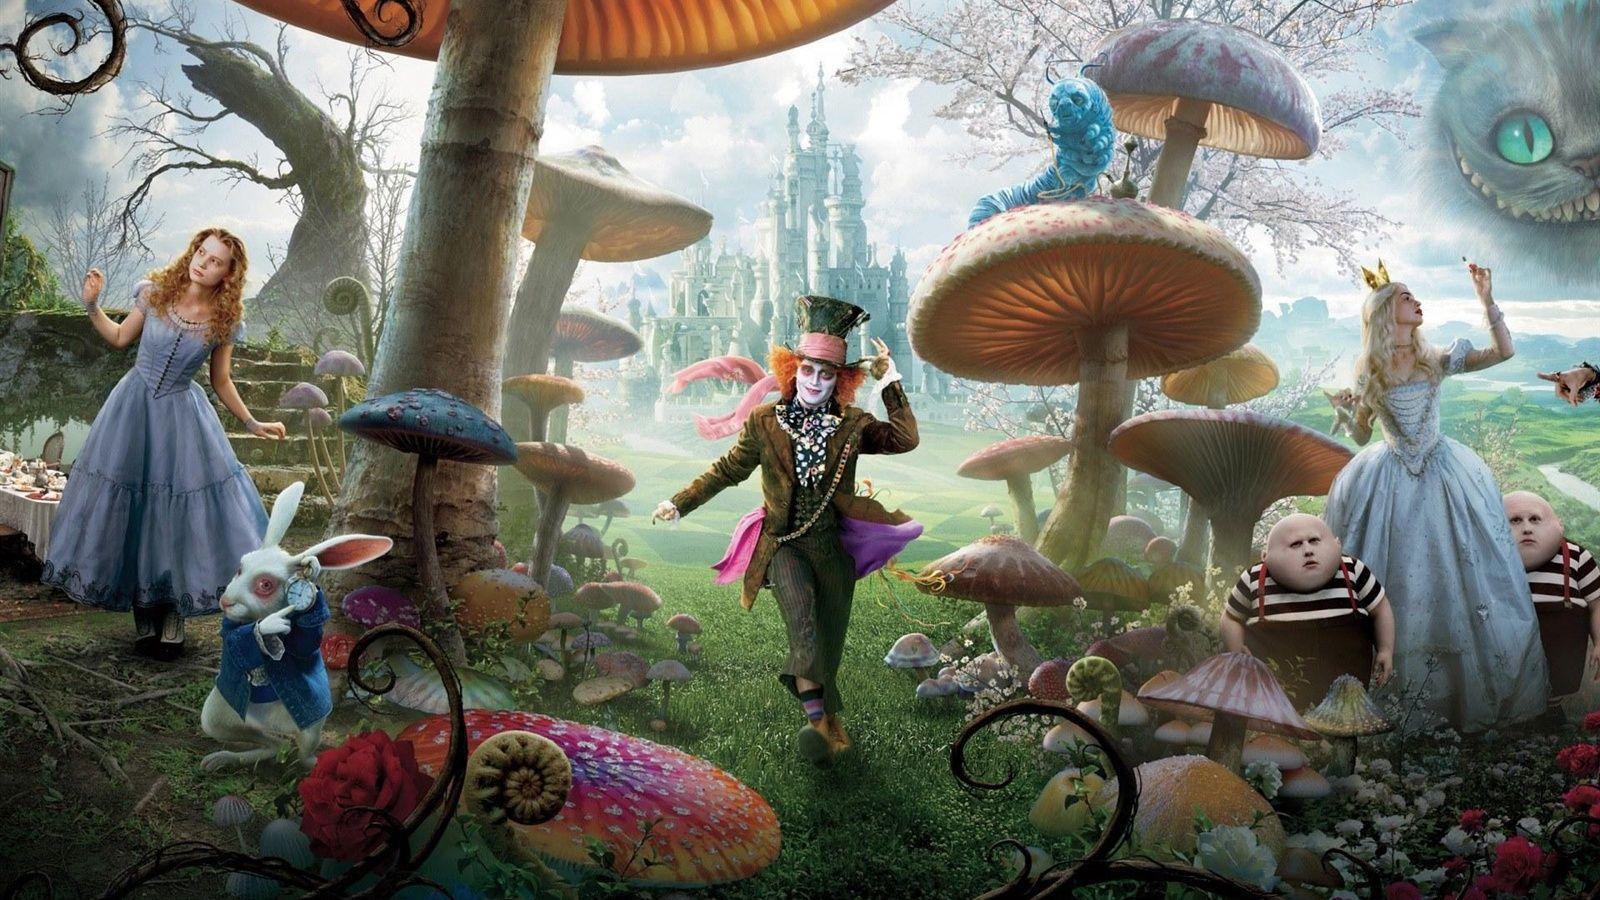 Alice-in-Wonderland-HD_1600x900.jpg